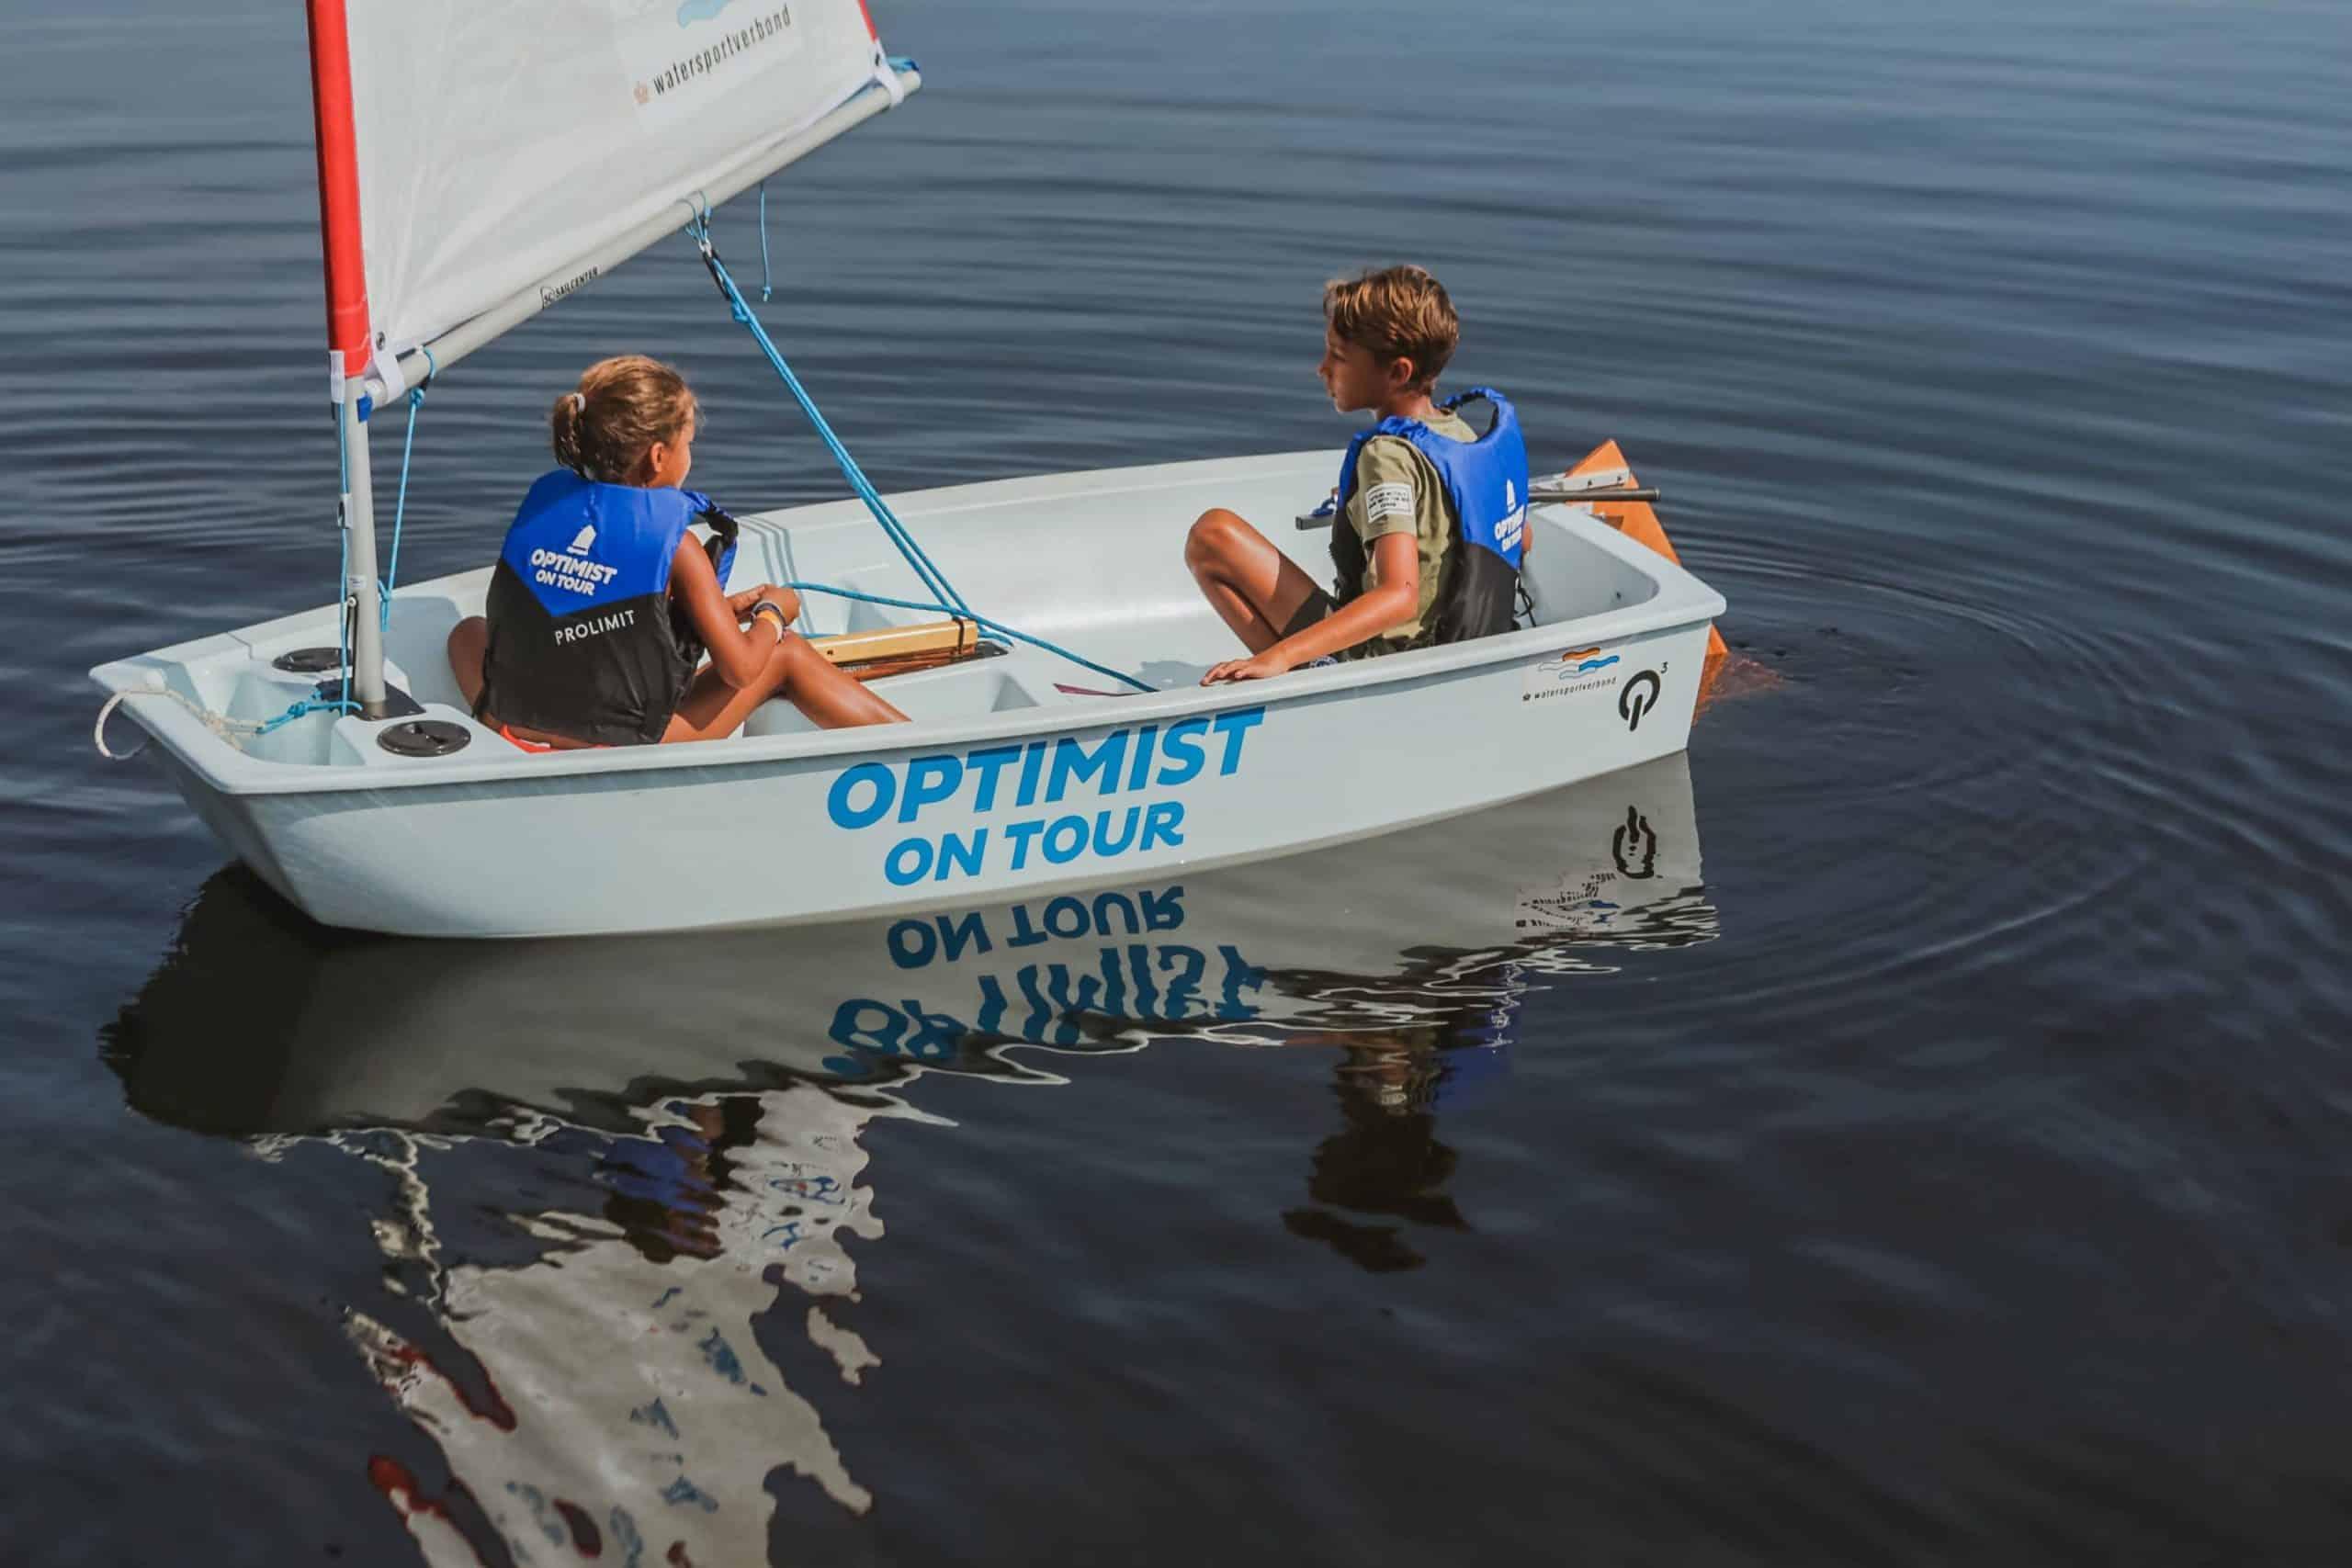 optimist on tour in Meerstad